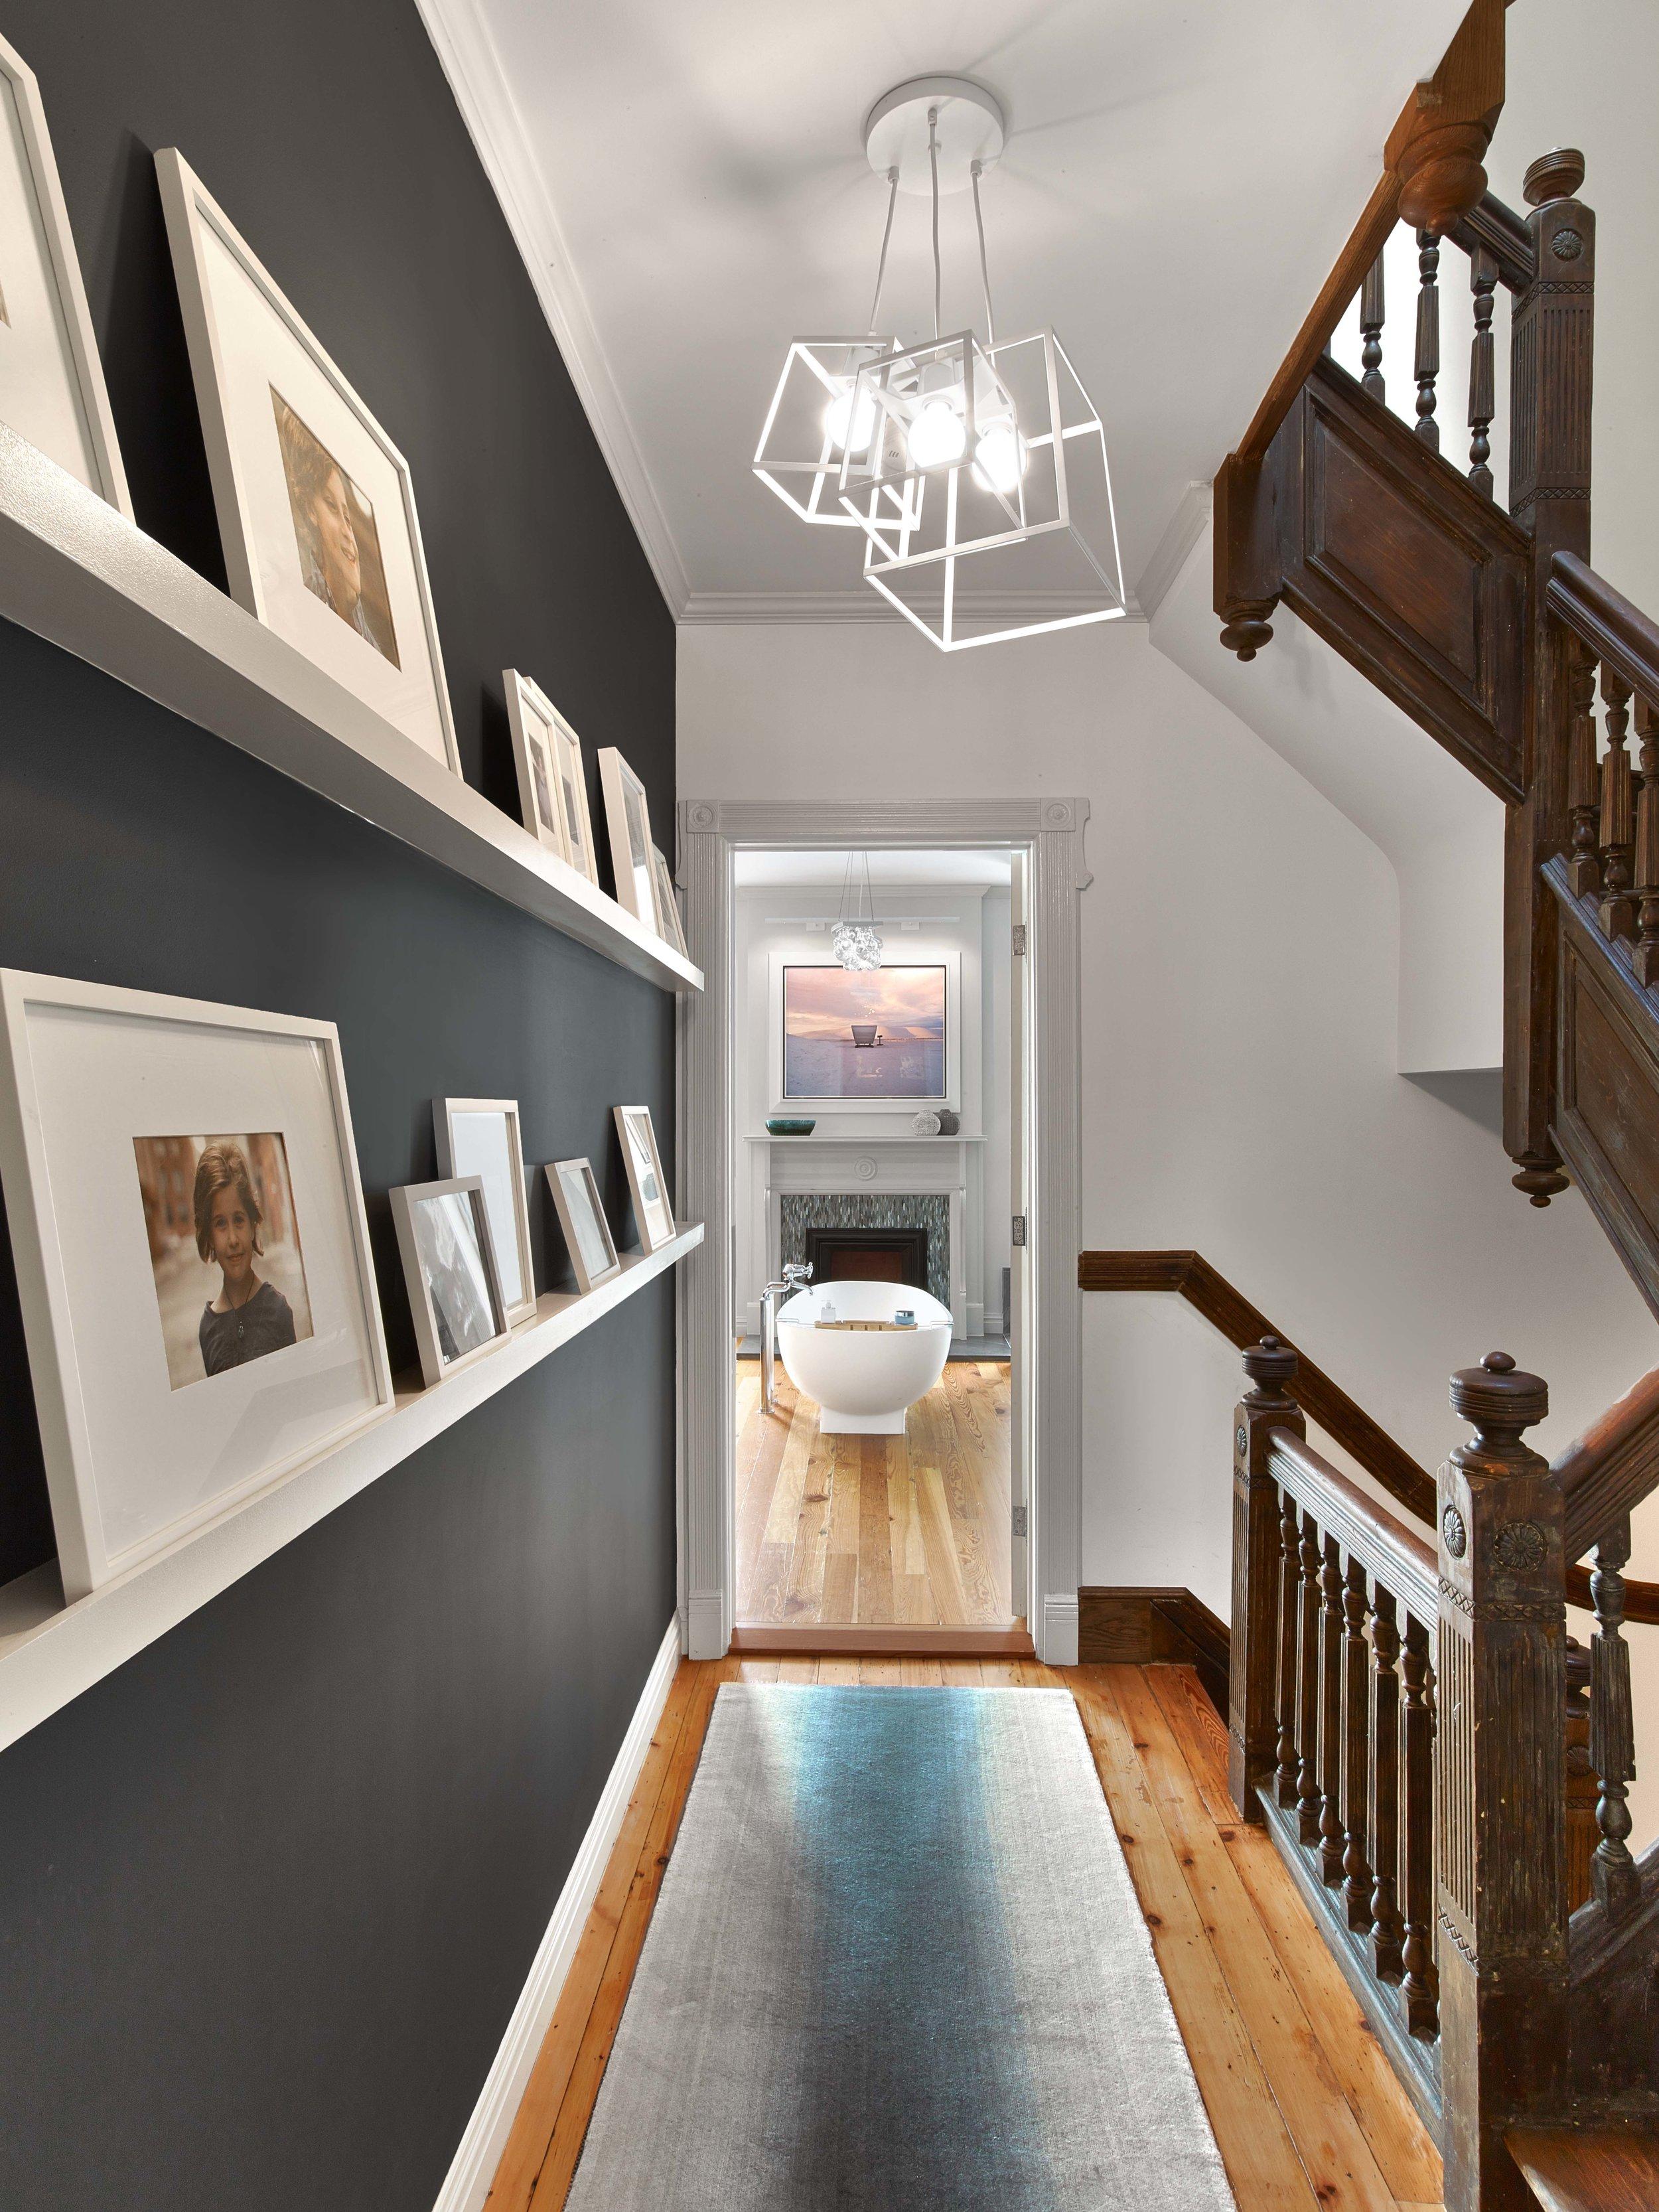 Hallway-Family-Photos-Modern-Bathtub-View-JMorris-Design-Brooklyn.jpg